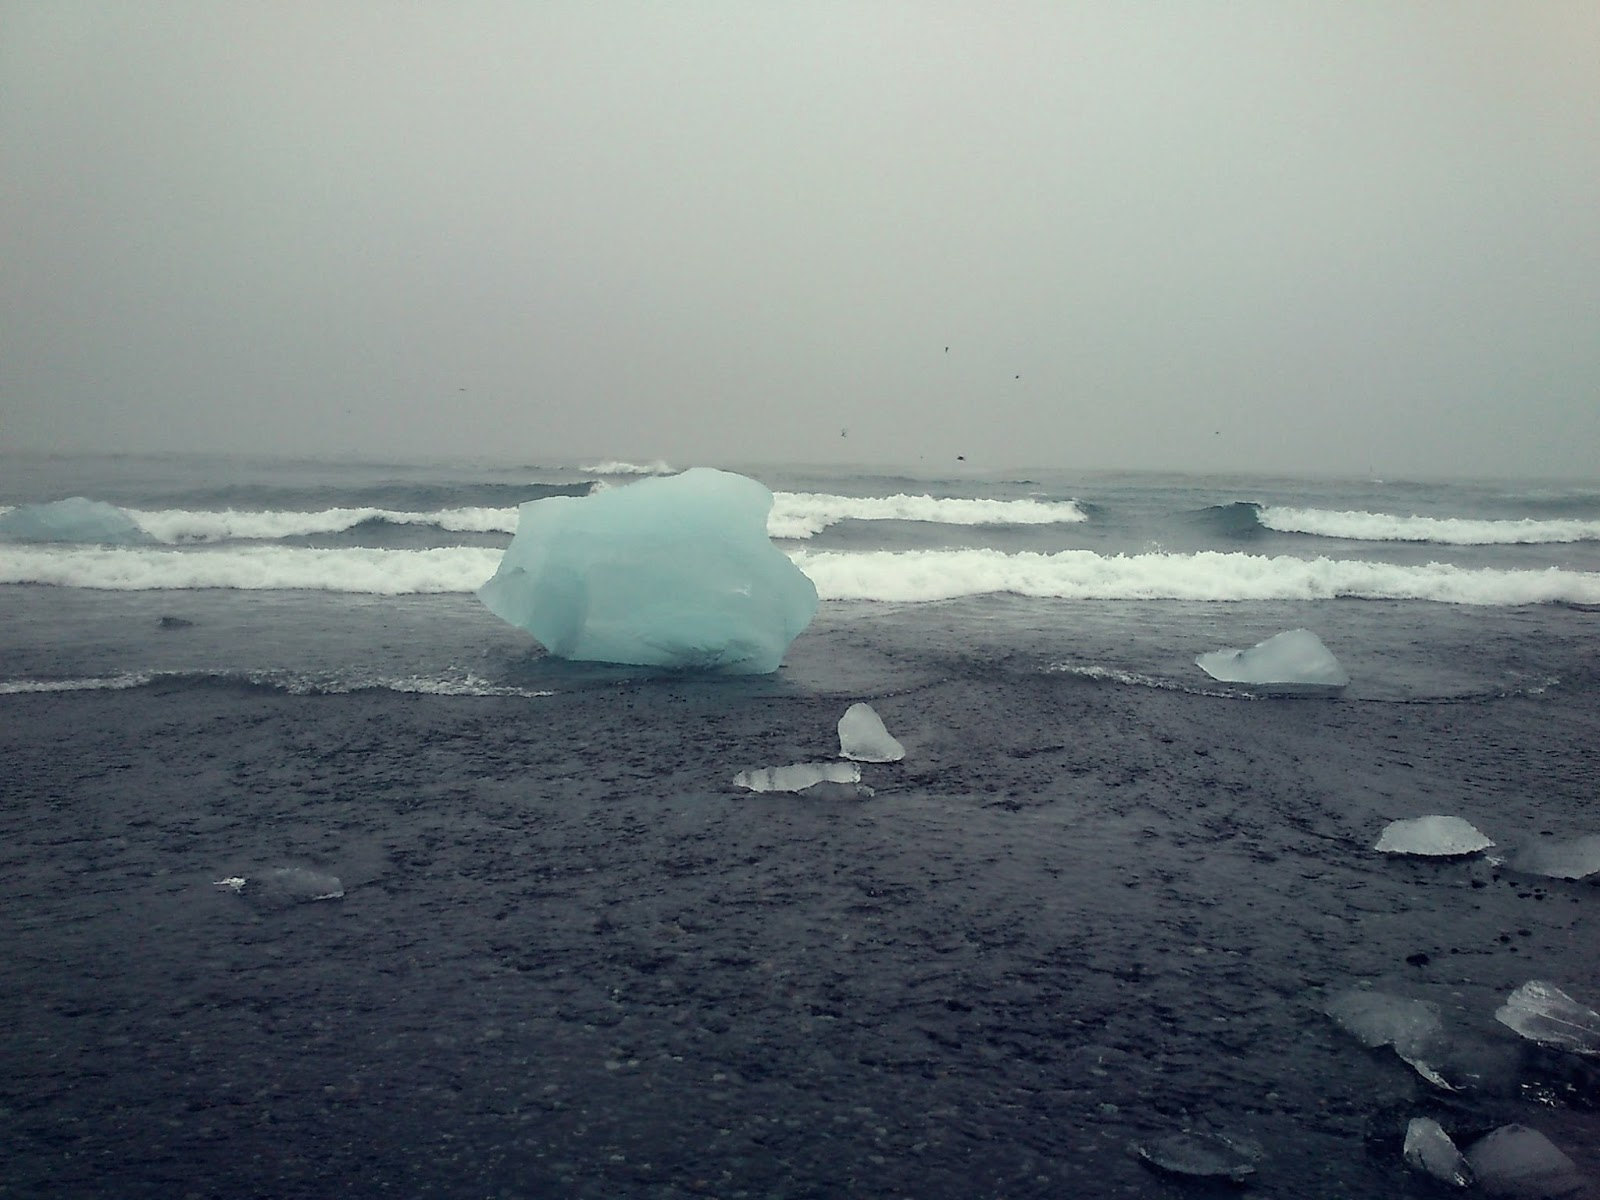 plaża przy Jökulsárlón, czarna plaża, islandzka plaża, Islandia, atrakcje Islandii